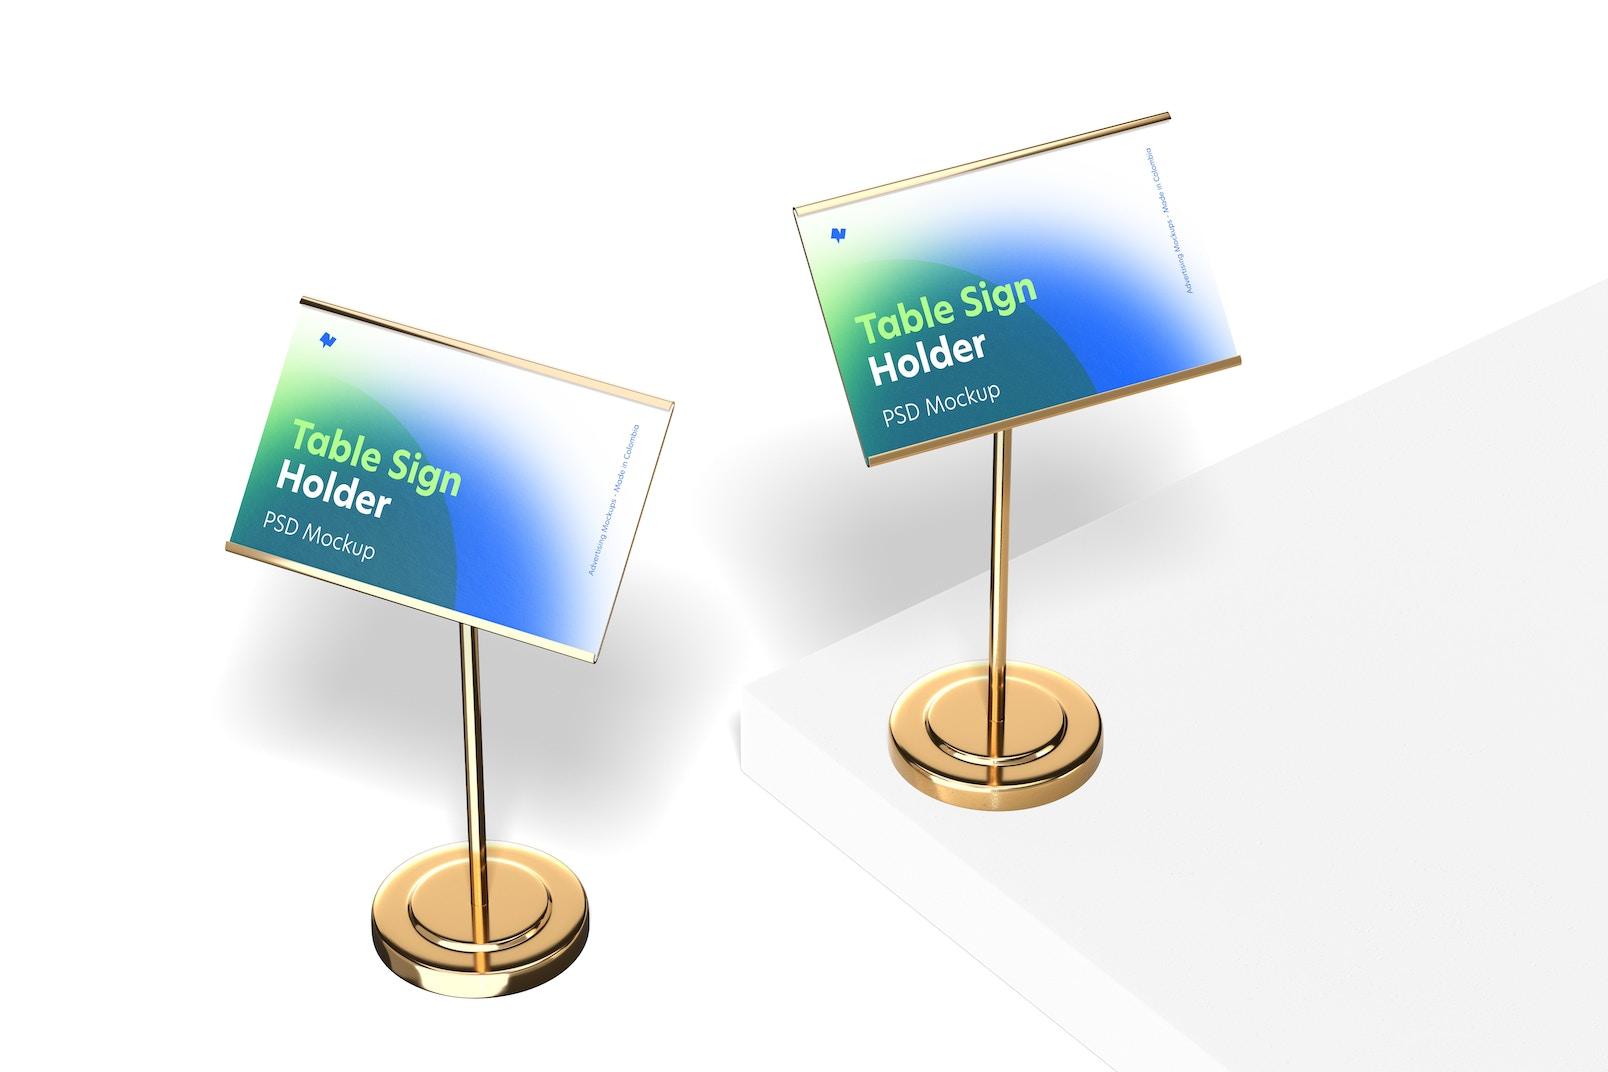 Table Sign Holders Metallic Base Mockup